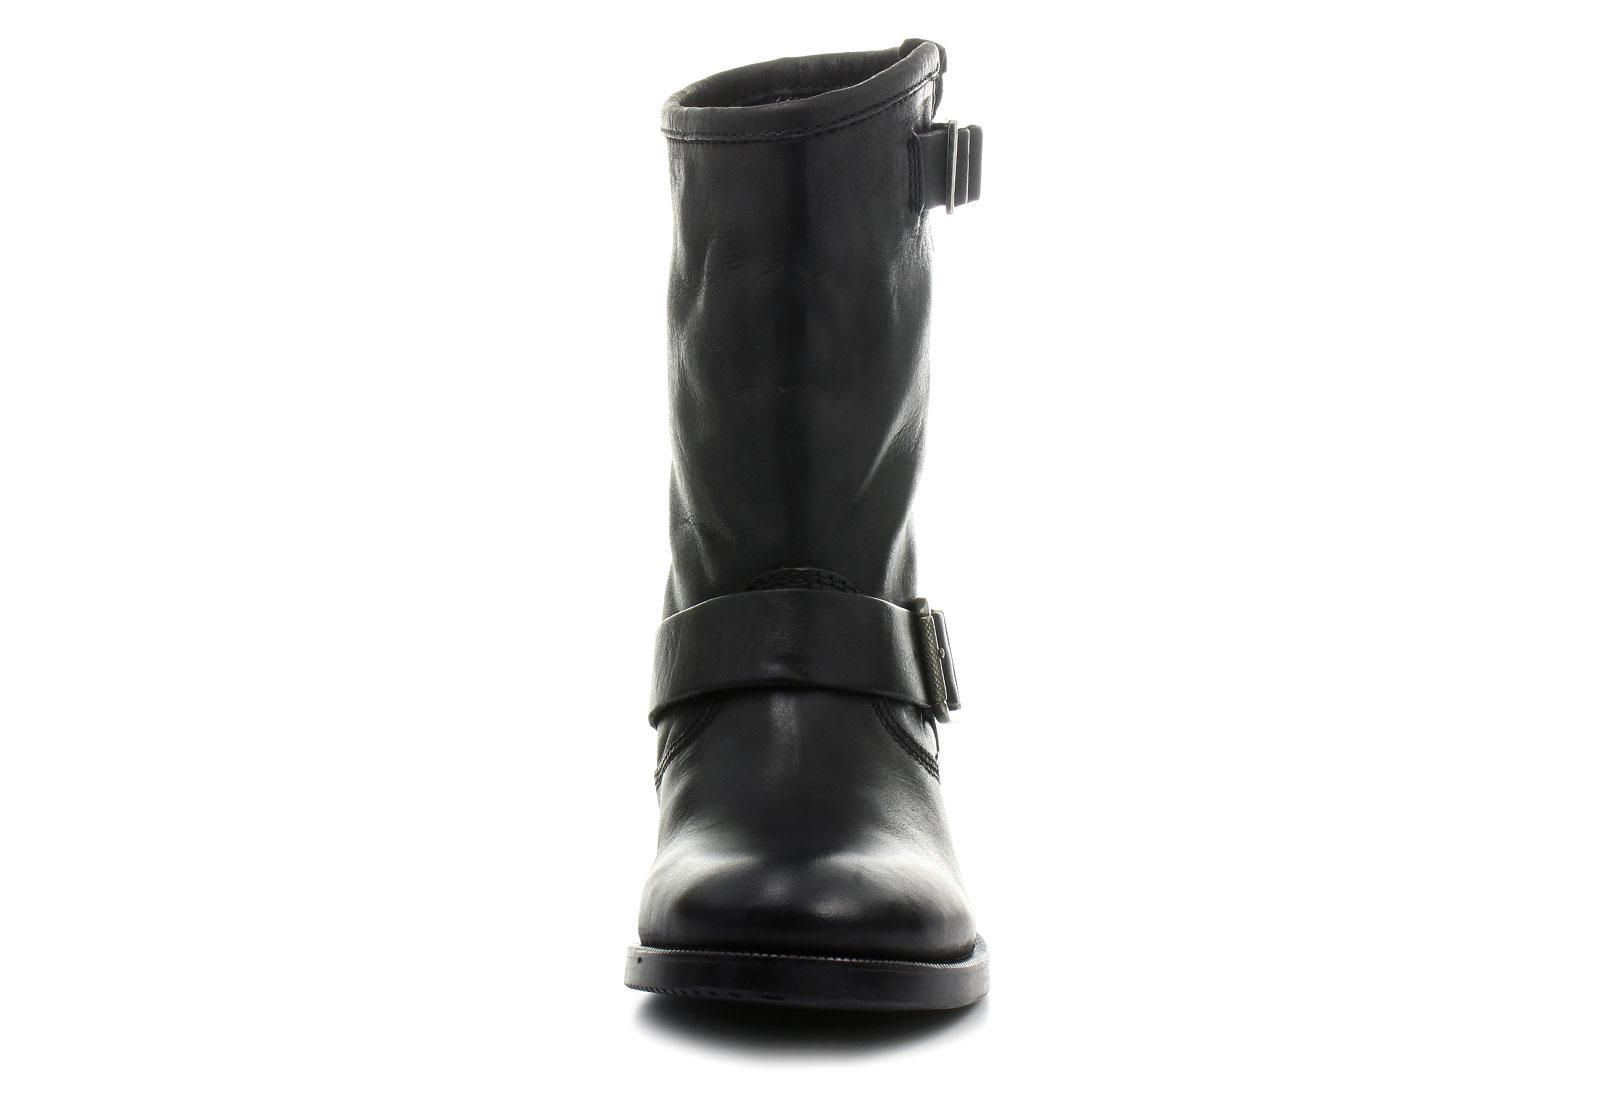 Tommy Hilfiger Csizma - Avive 15a - 16F-1914-990 - Office Shoes ... 2b5b68c434